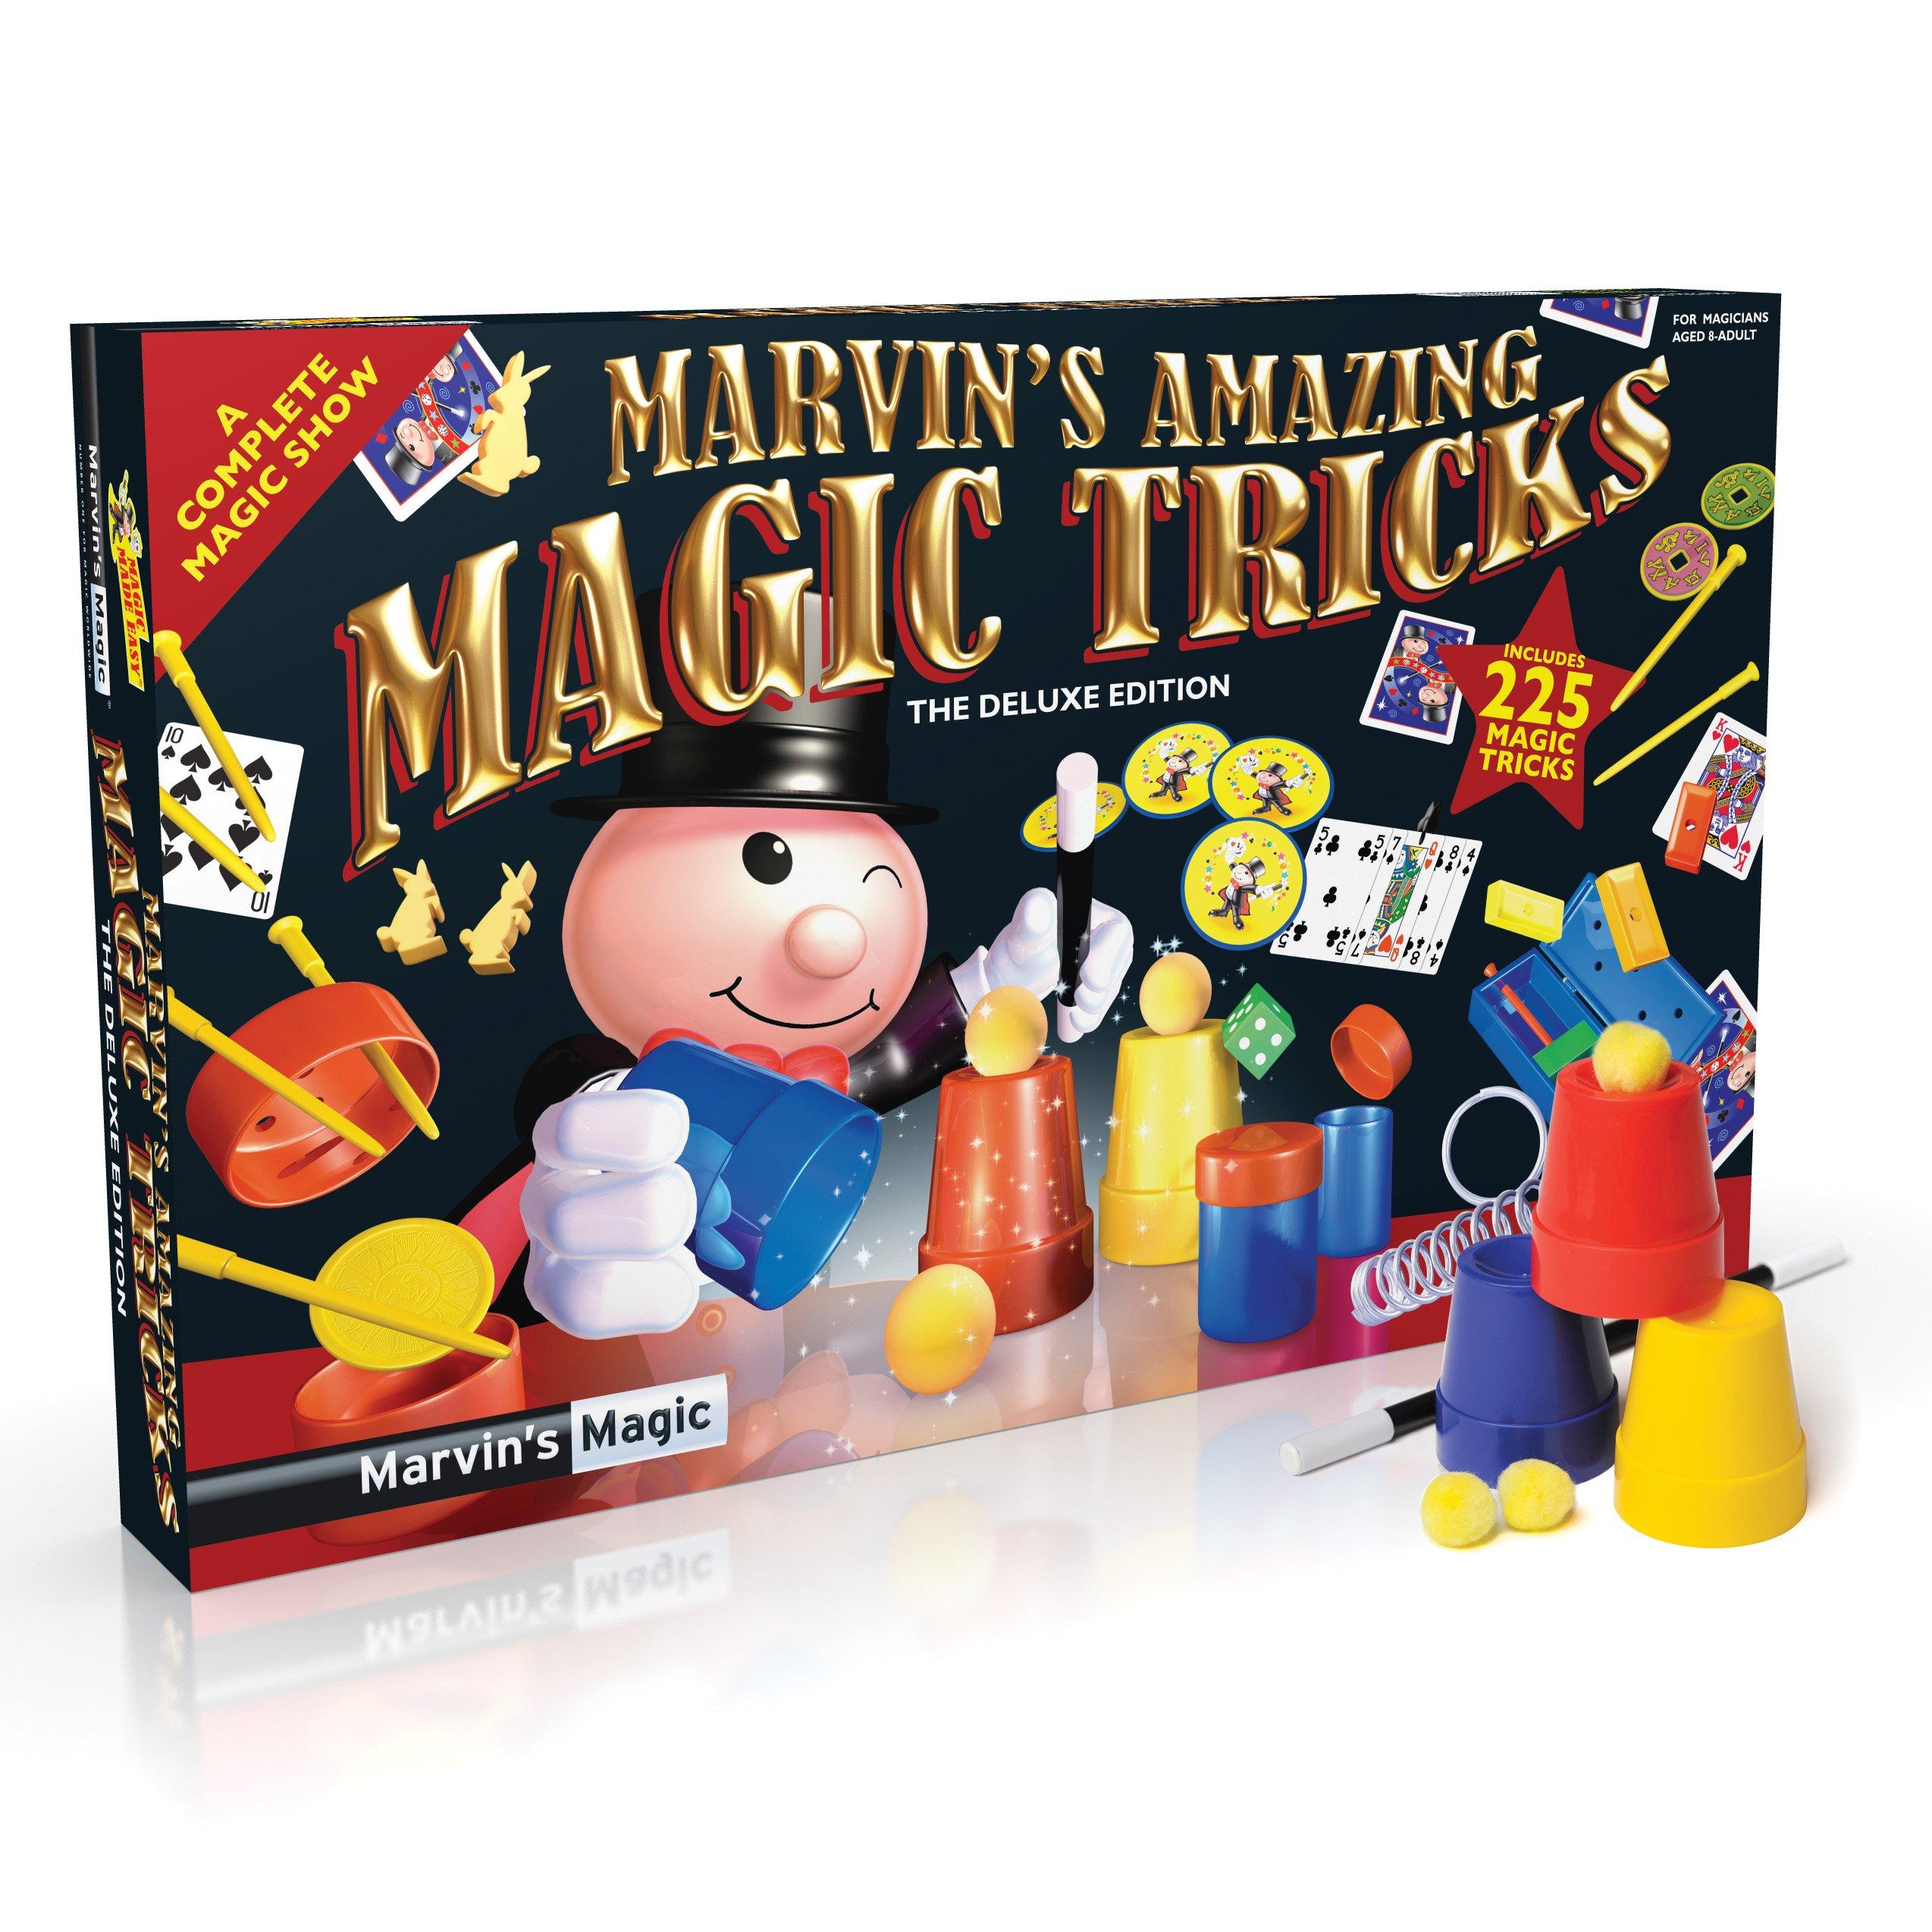 Marvin's Magic Amazing Magic Tricks (Box of 225) by Marvin's Magic (Image #1)